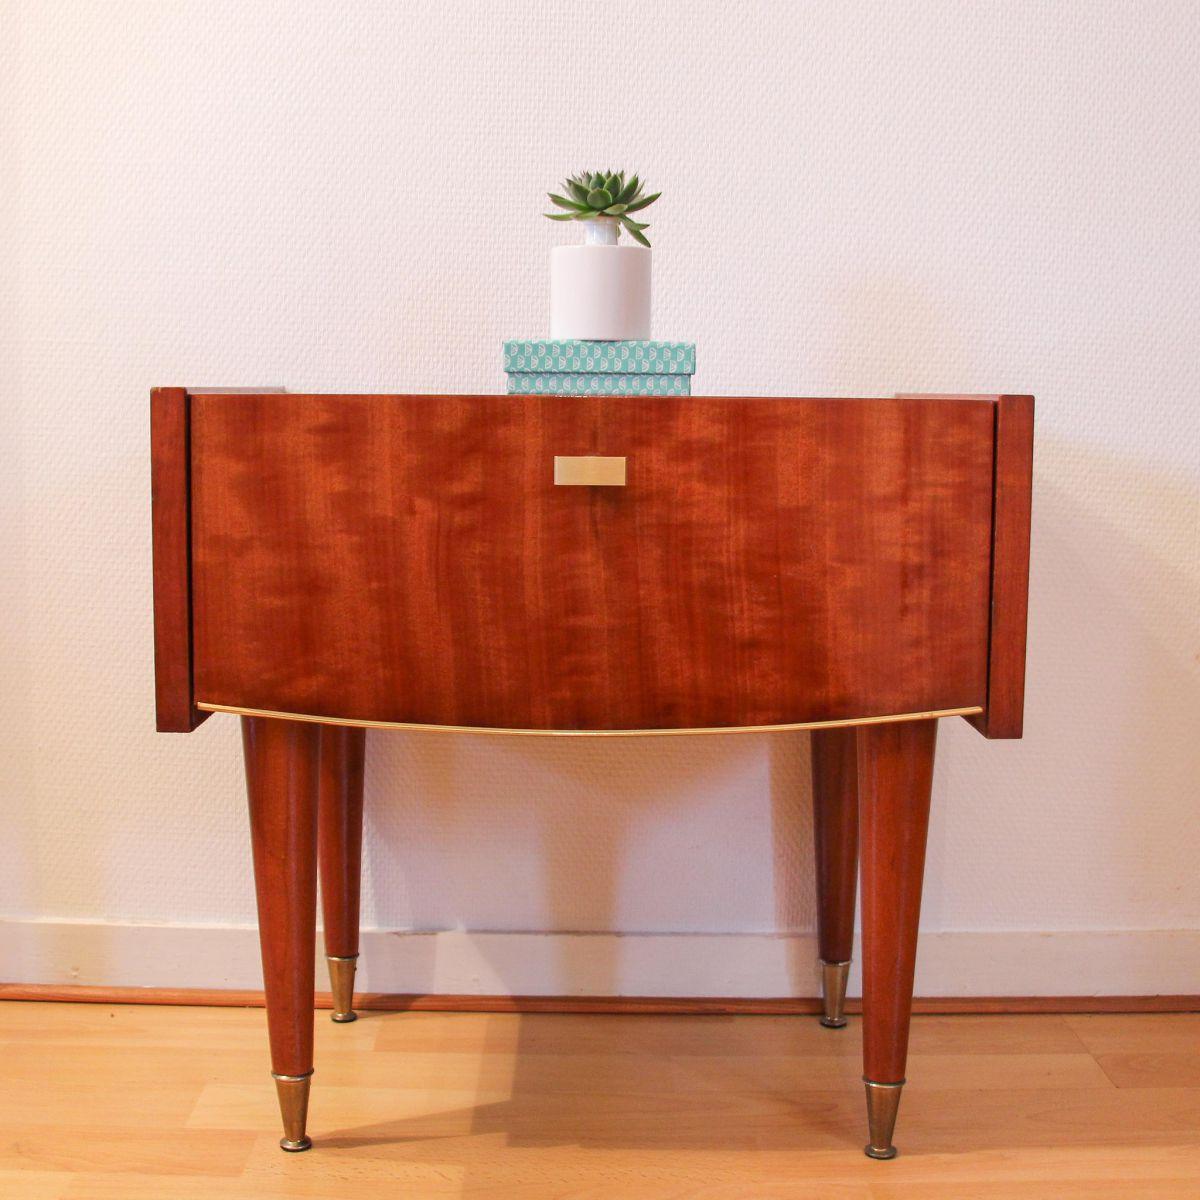 table de chevet ann e 60 r tro luckyfind. Black Bedroom Furniture Sets. Home Design Ideas